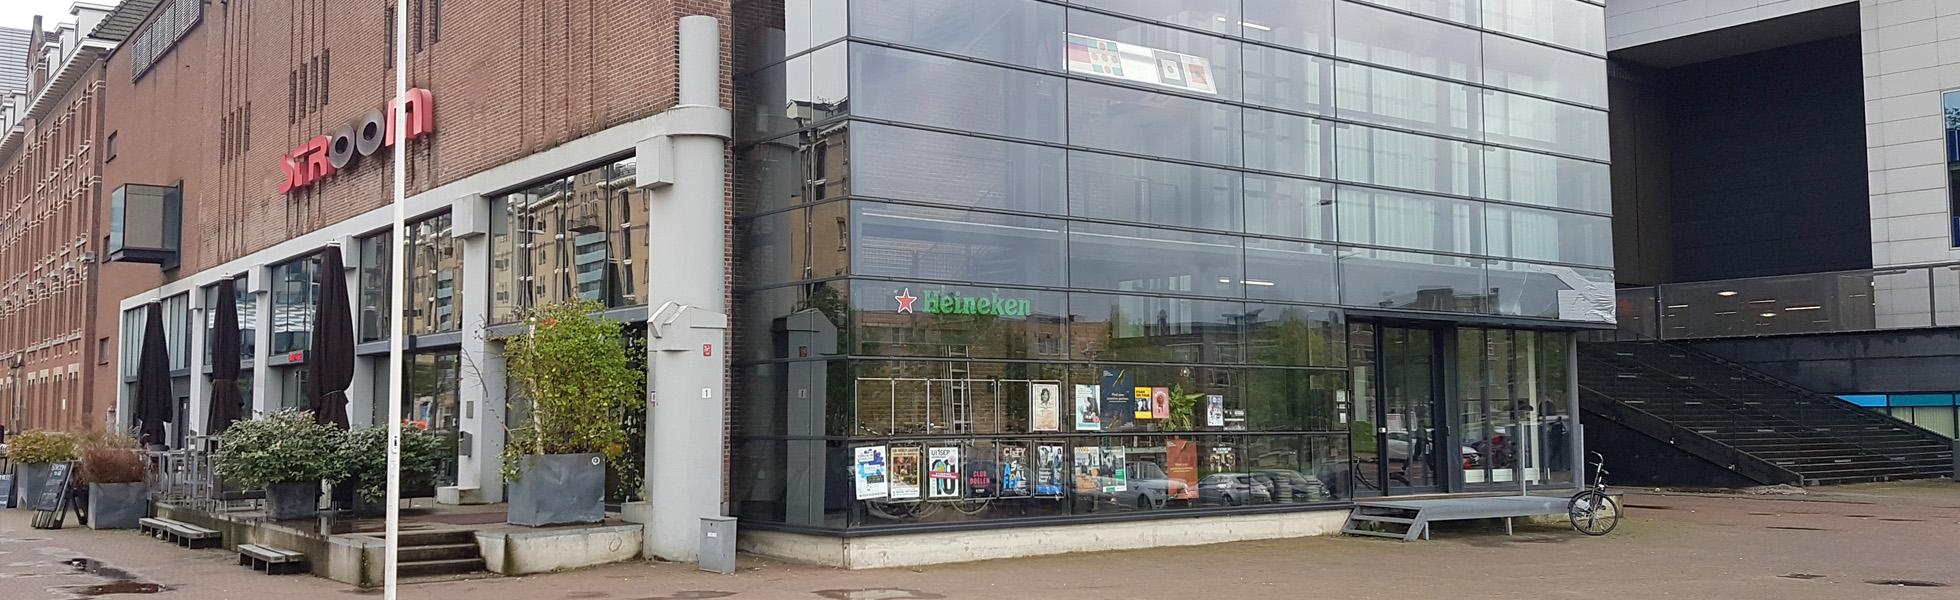 STROOM Rotterdam - na de verbouwing